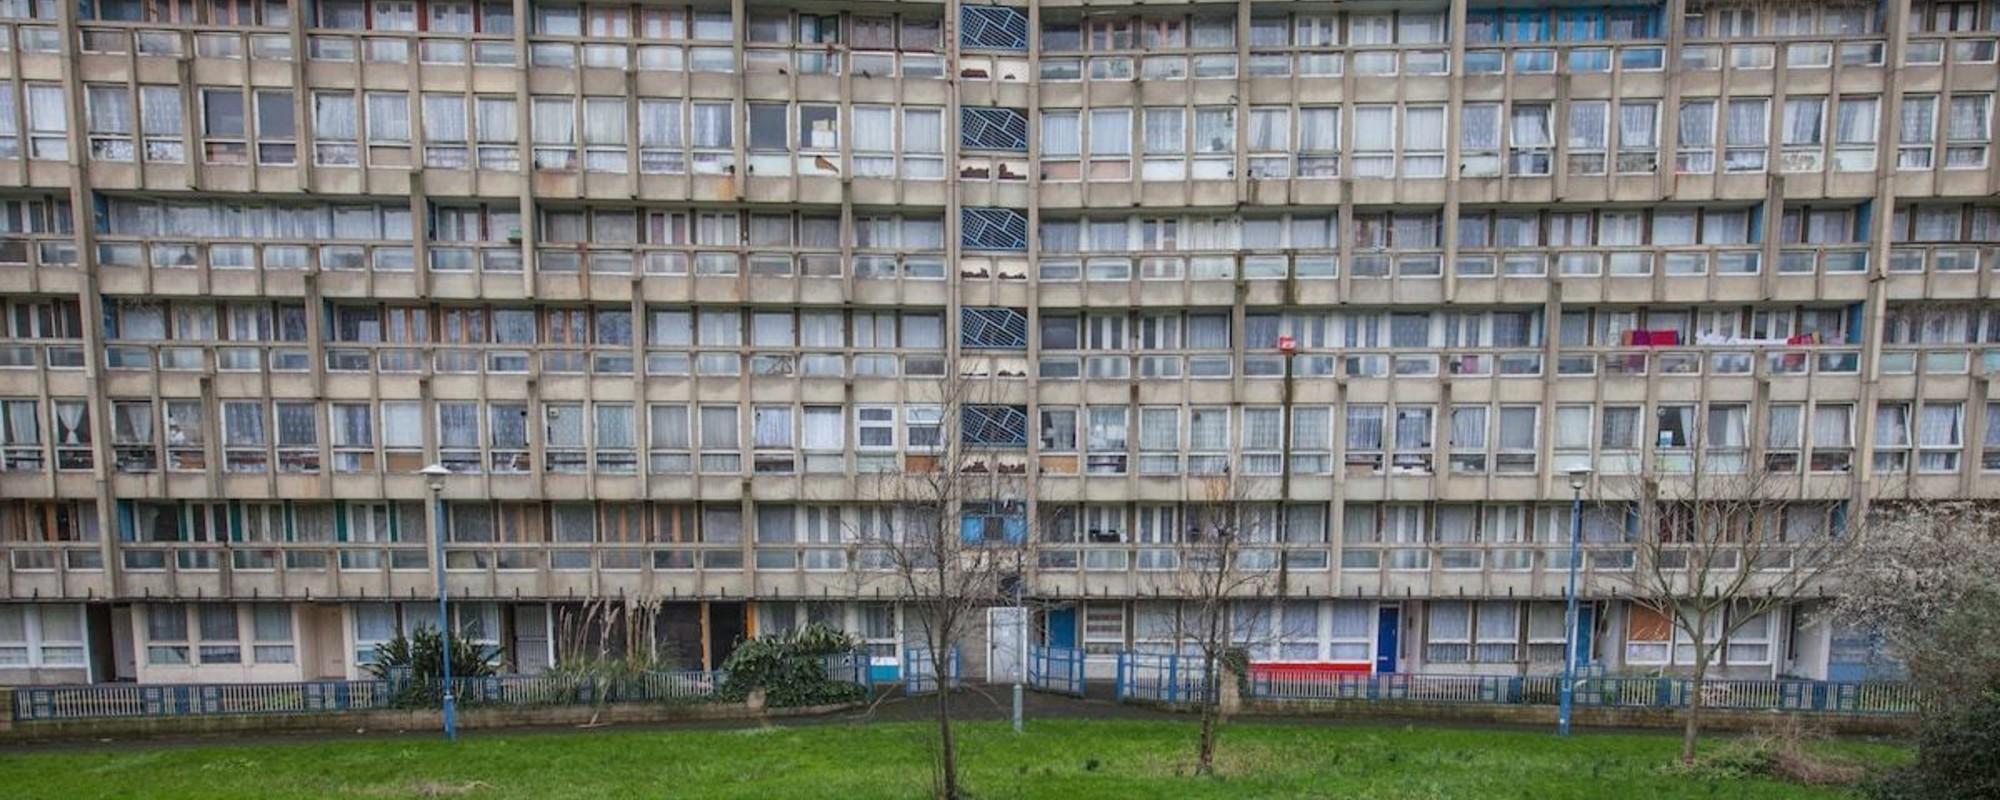 Foto delle ultime case popolari londinesi